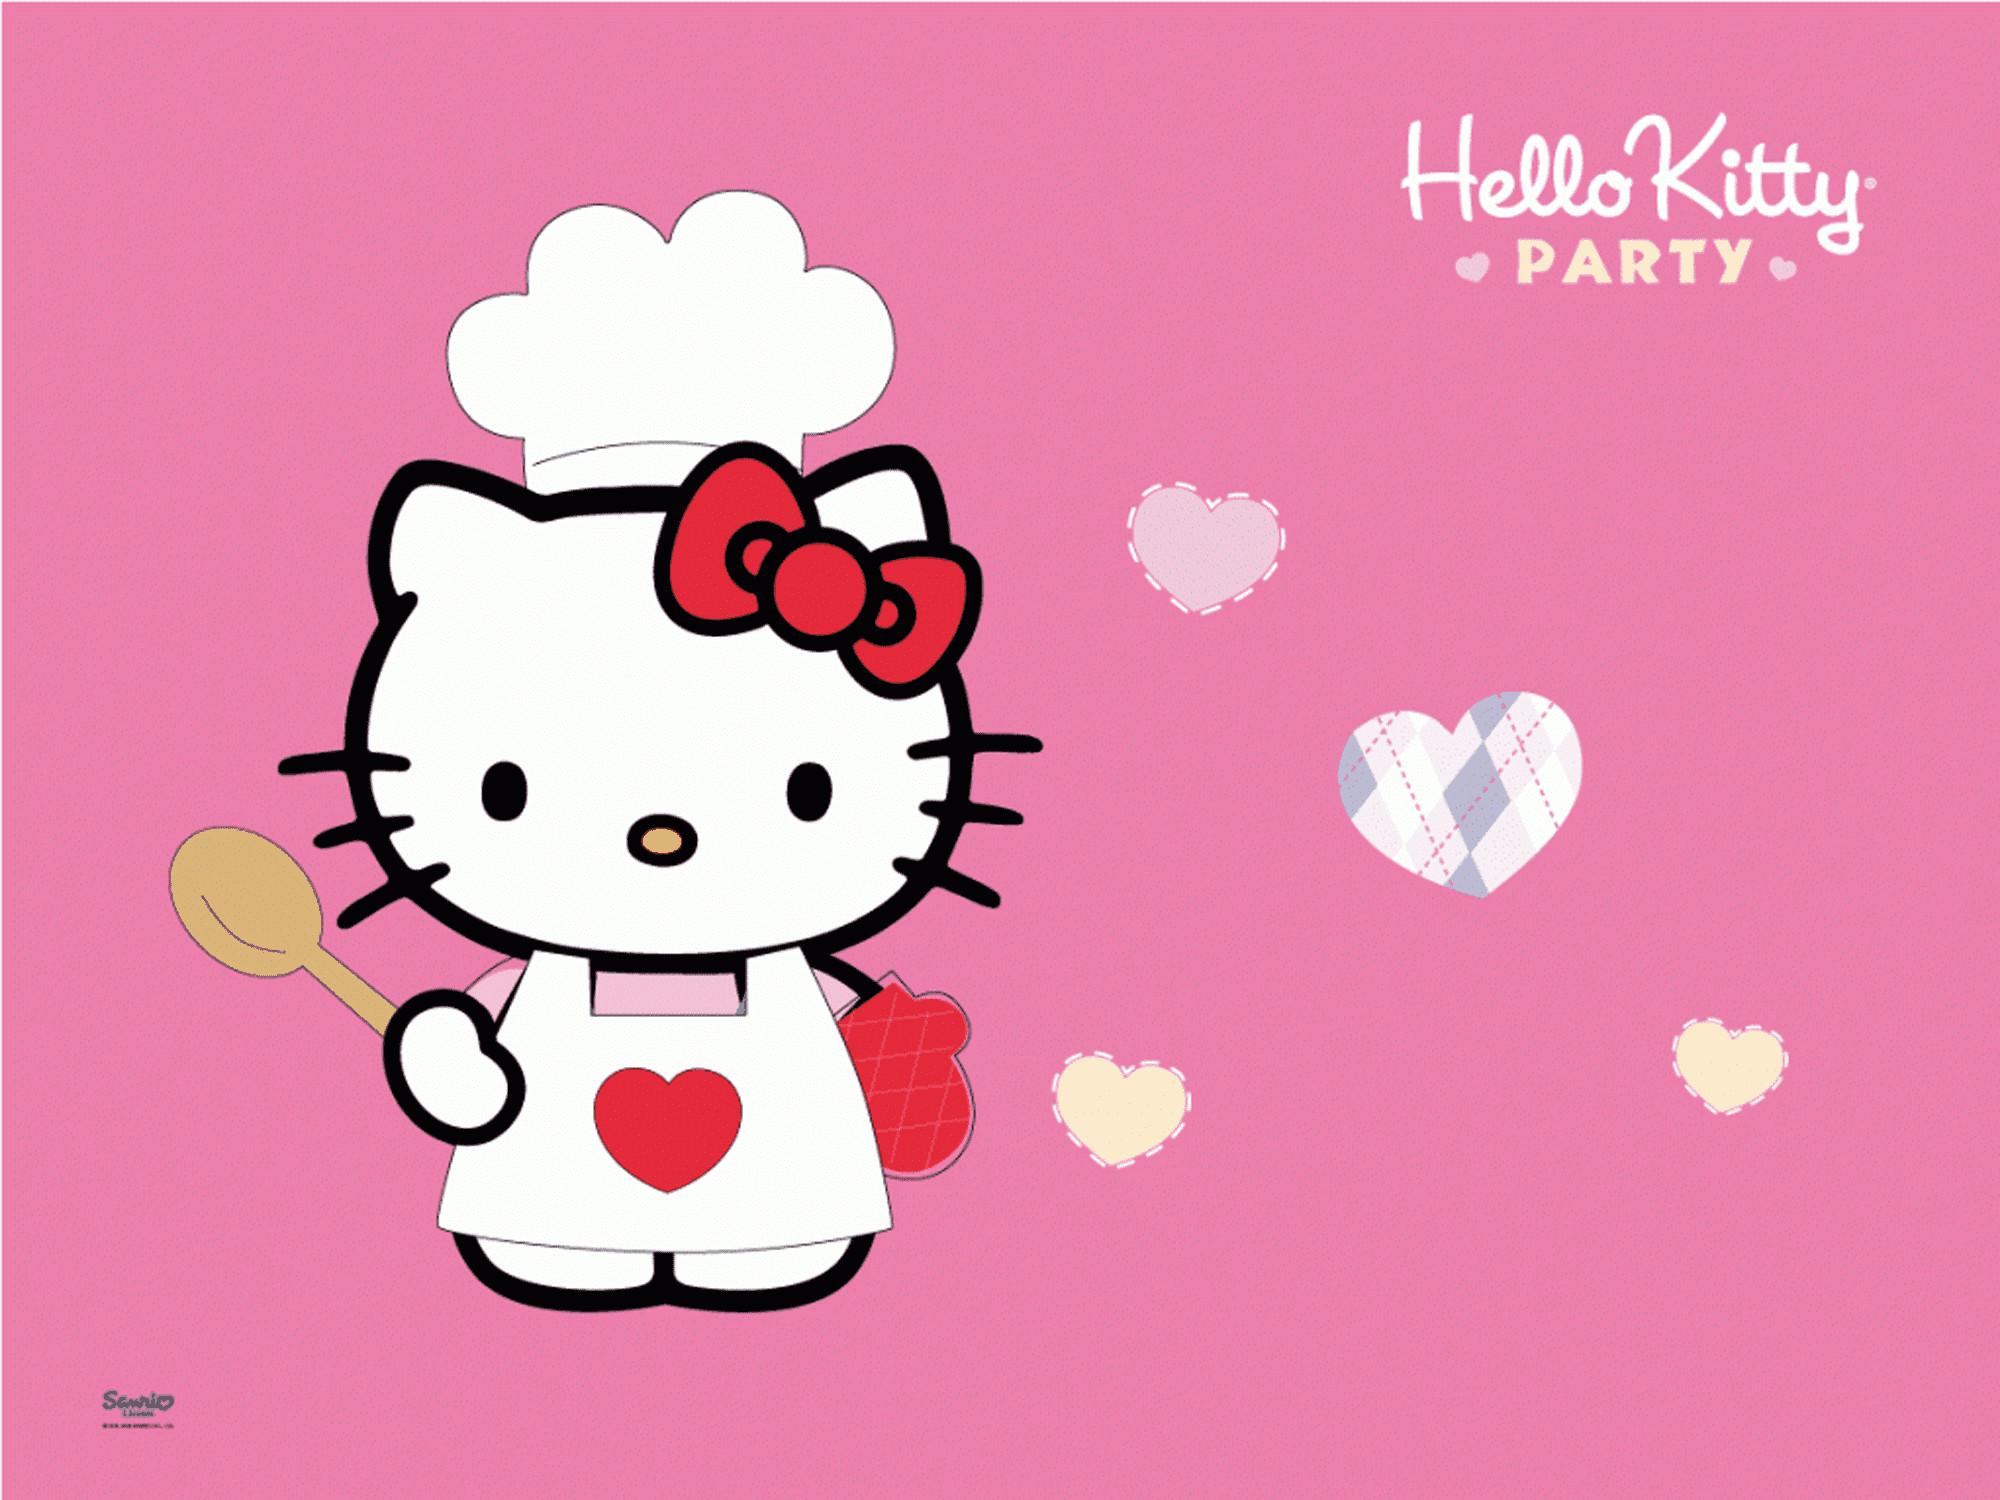 Wonderful Wallpaper Hello Kitty Vintage - 1060688-pink-hello-kitty-background-2000x1500-ipad  Perfect Image Reference_23787.jpg